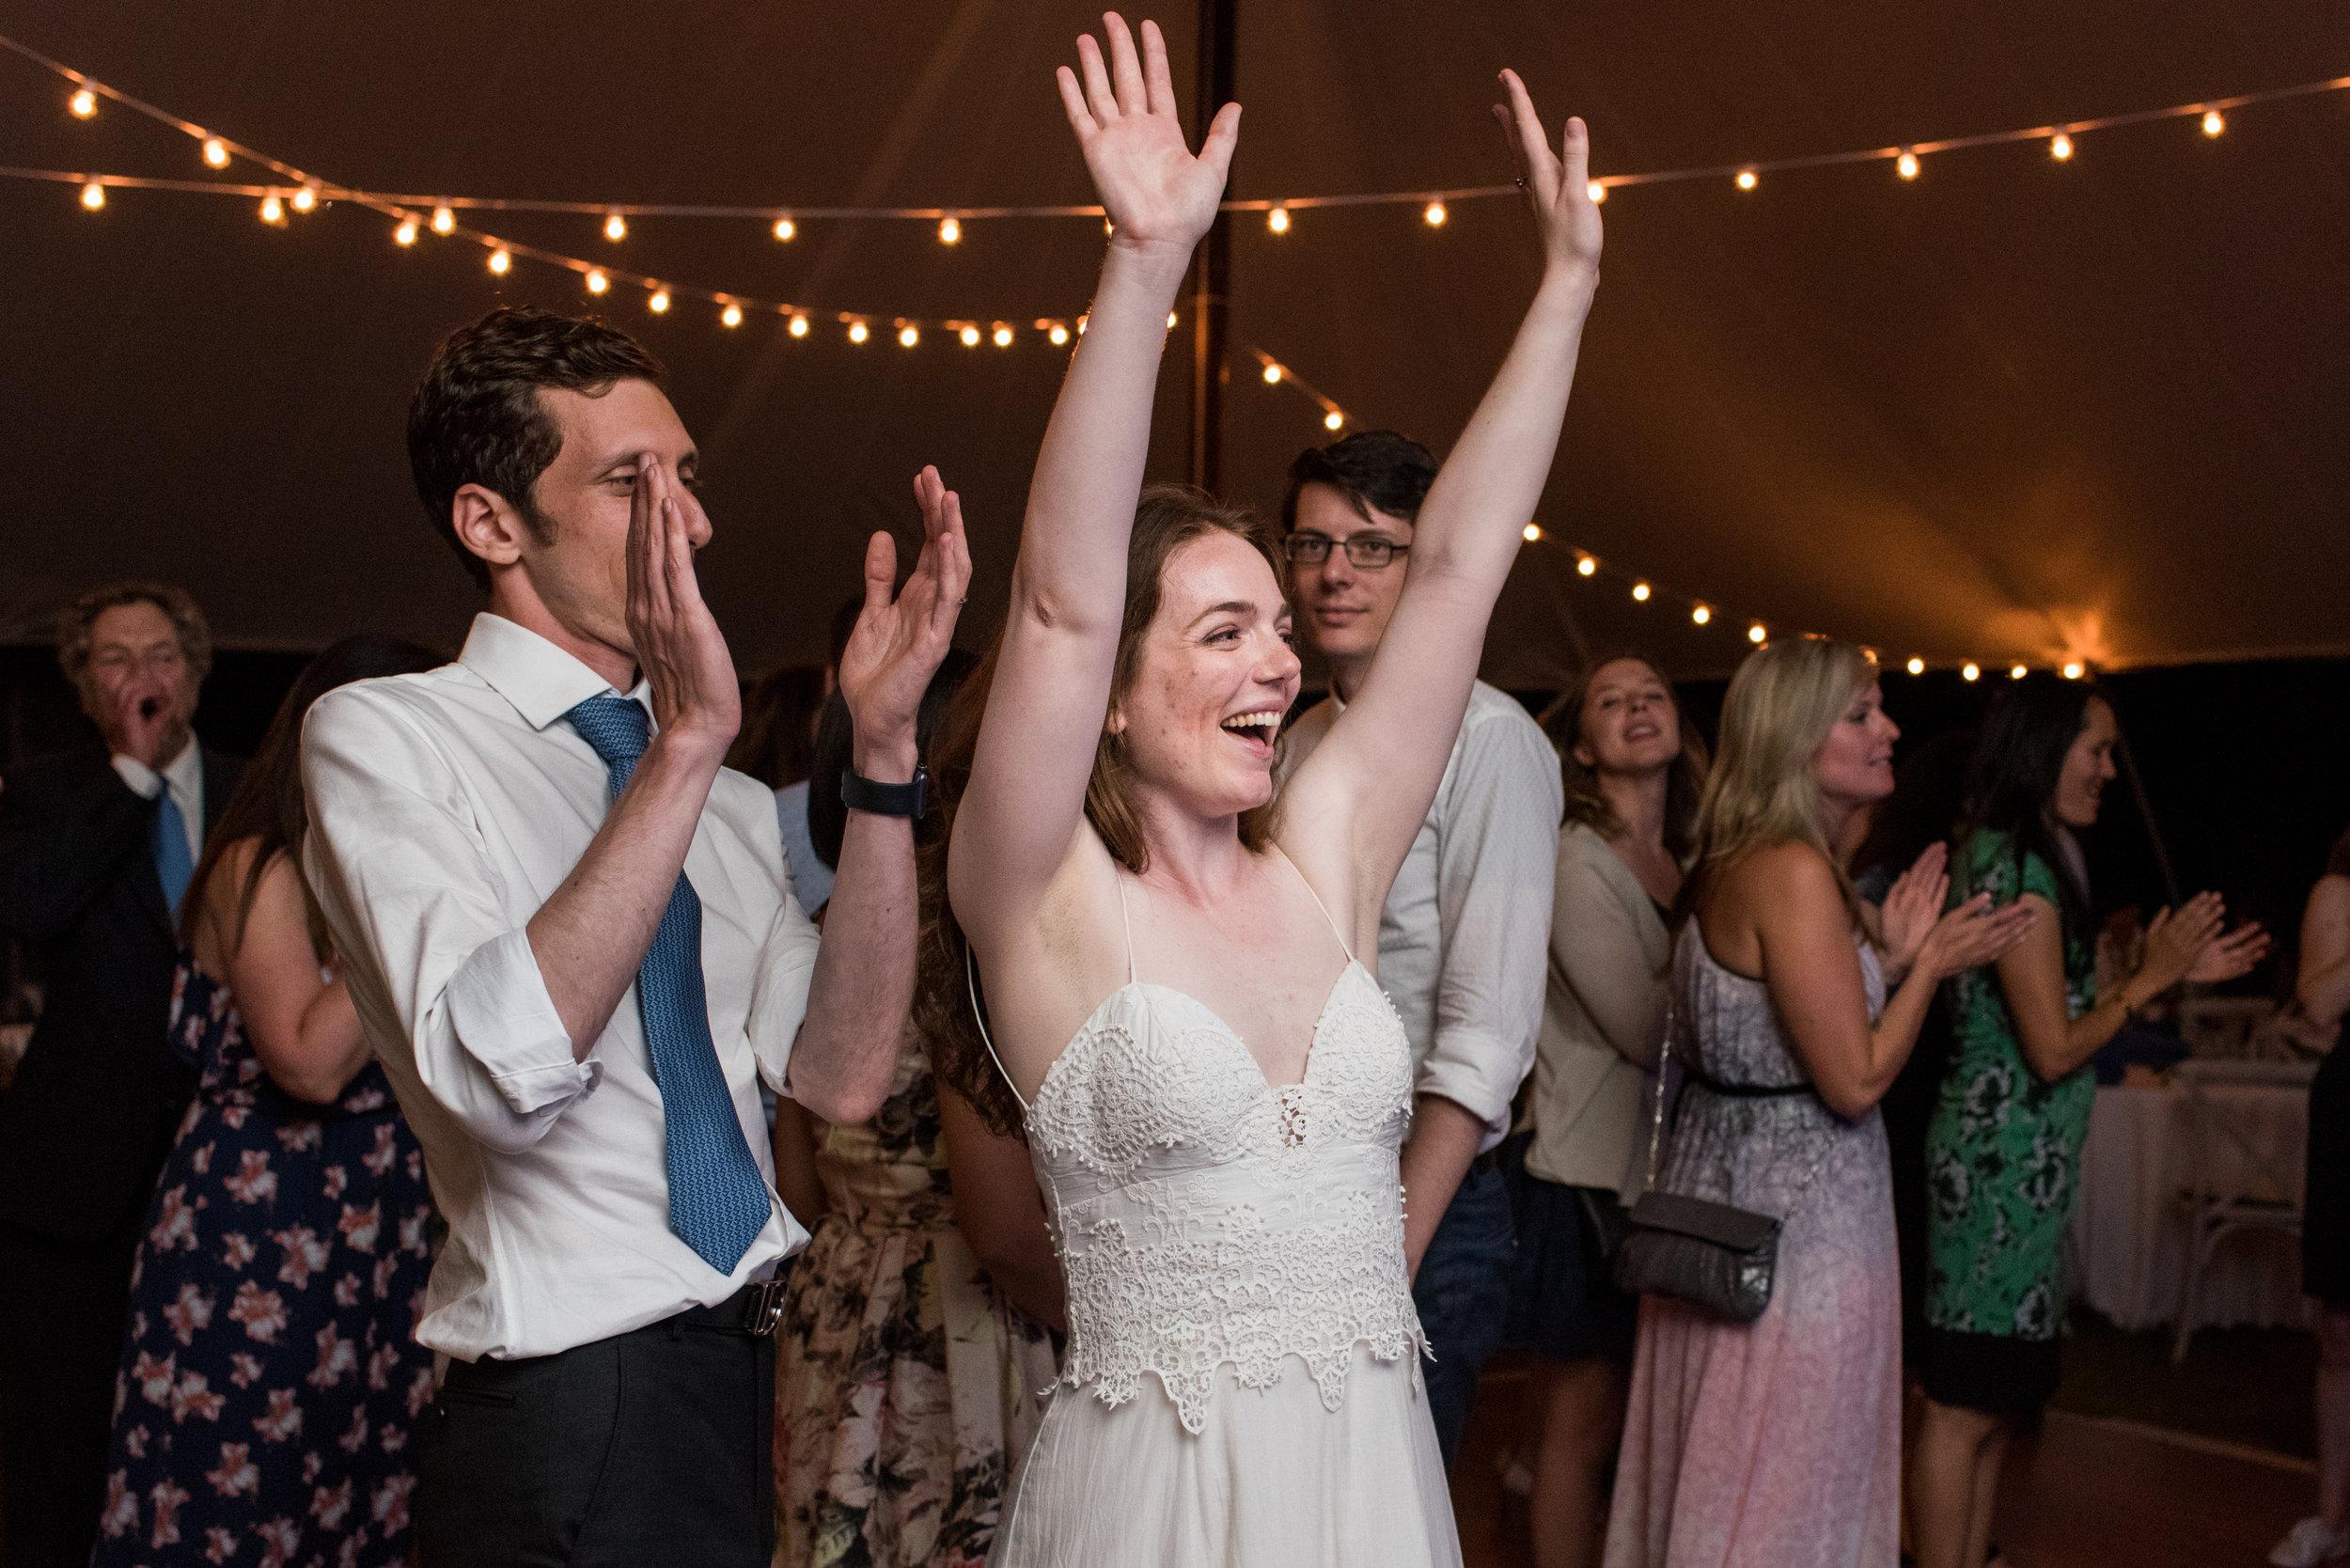 Stefy Hilmer Photograhy- bride having so much fun at her wedding reception.jpg